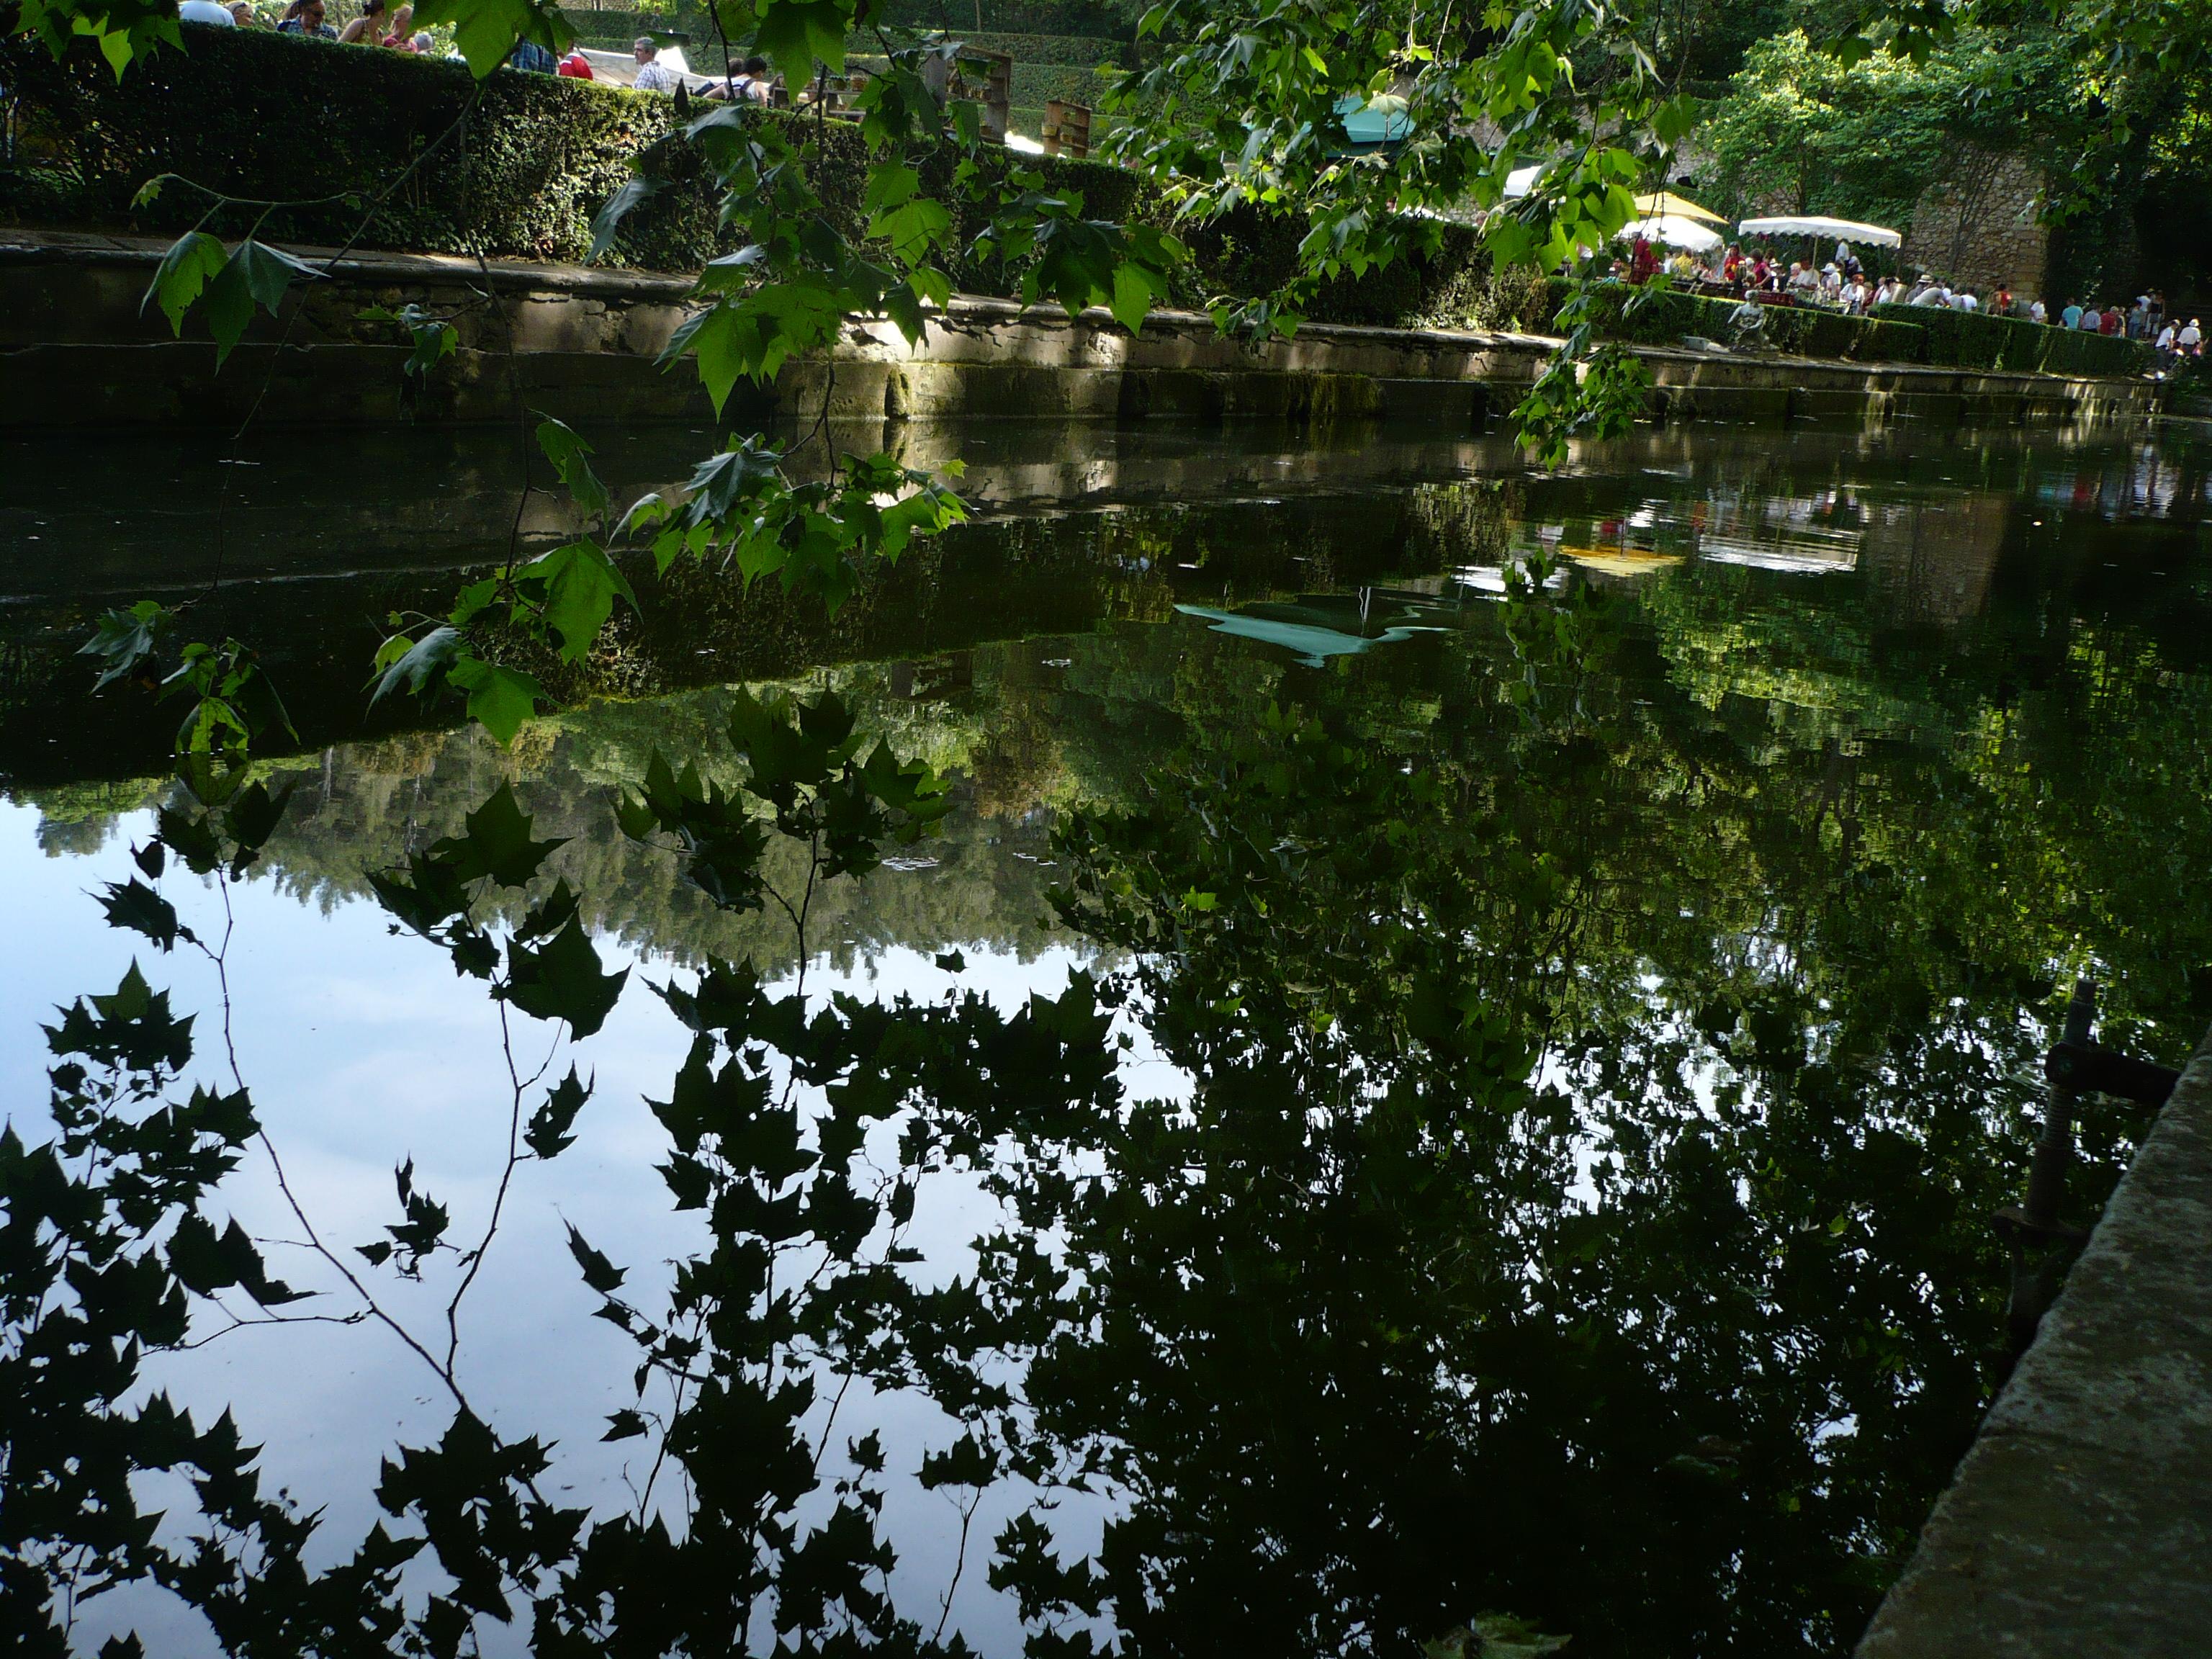 le-jardin-dalbertas-et-ses-splendeurs-045.JPG